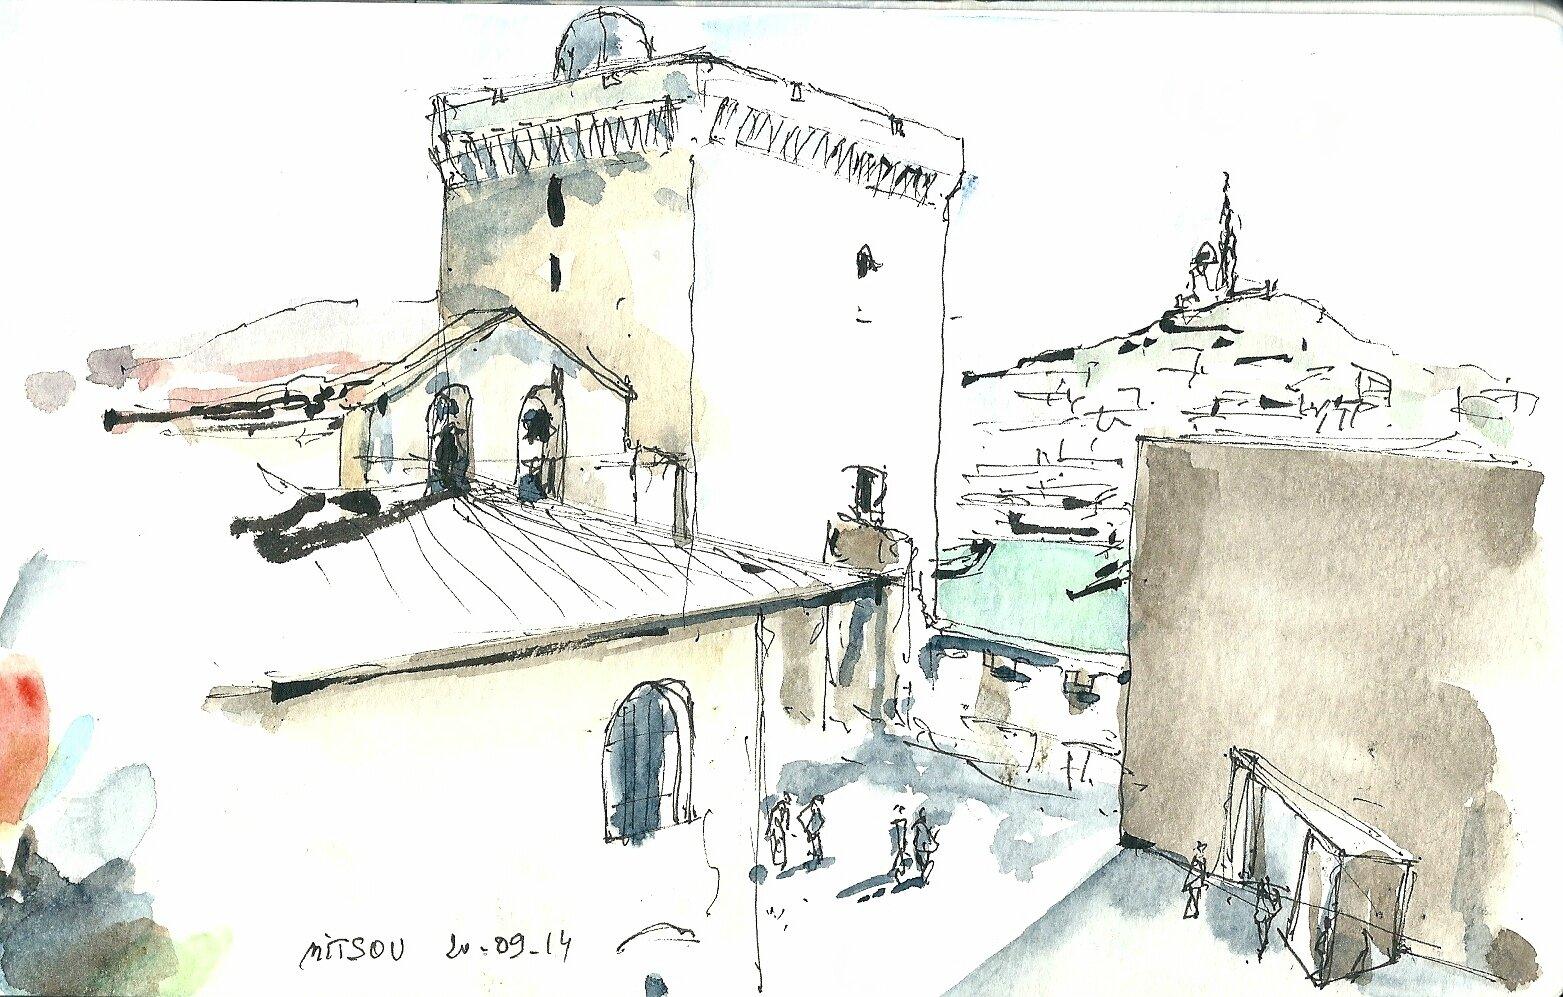 Marseille UsKF 2ème coup d 'oeil